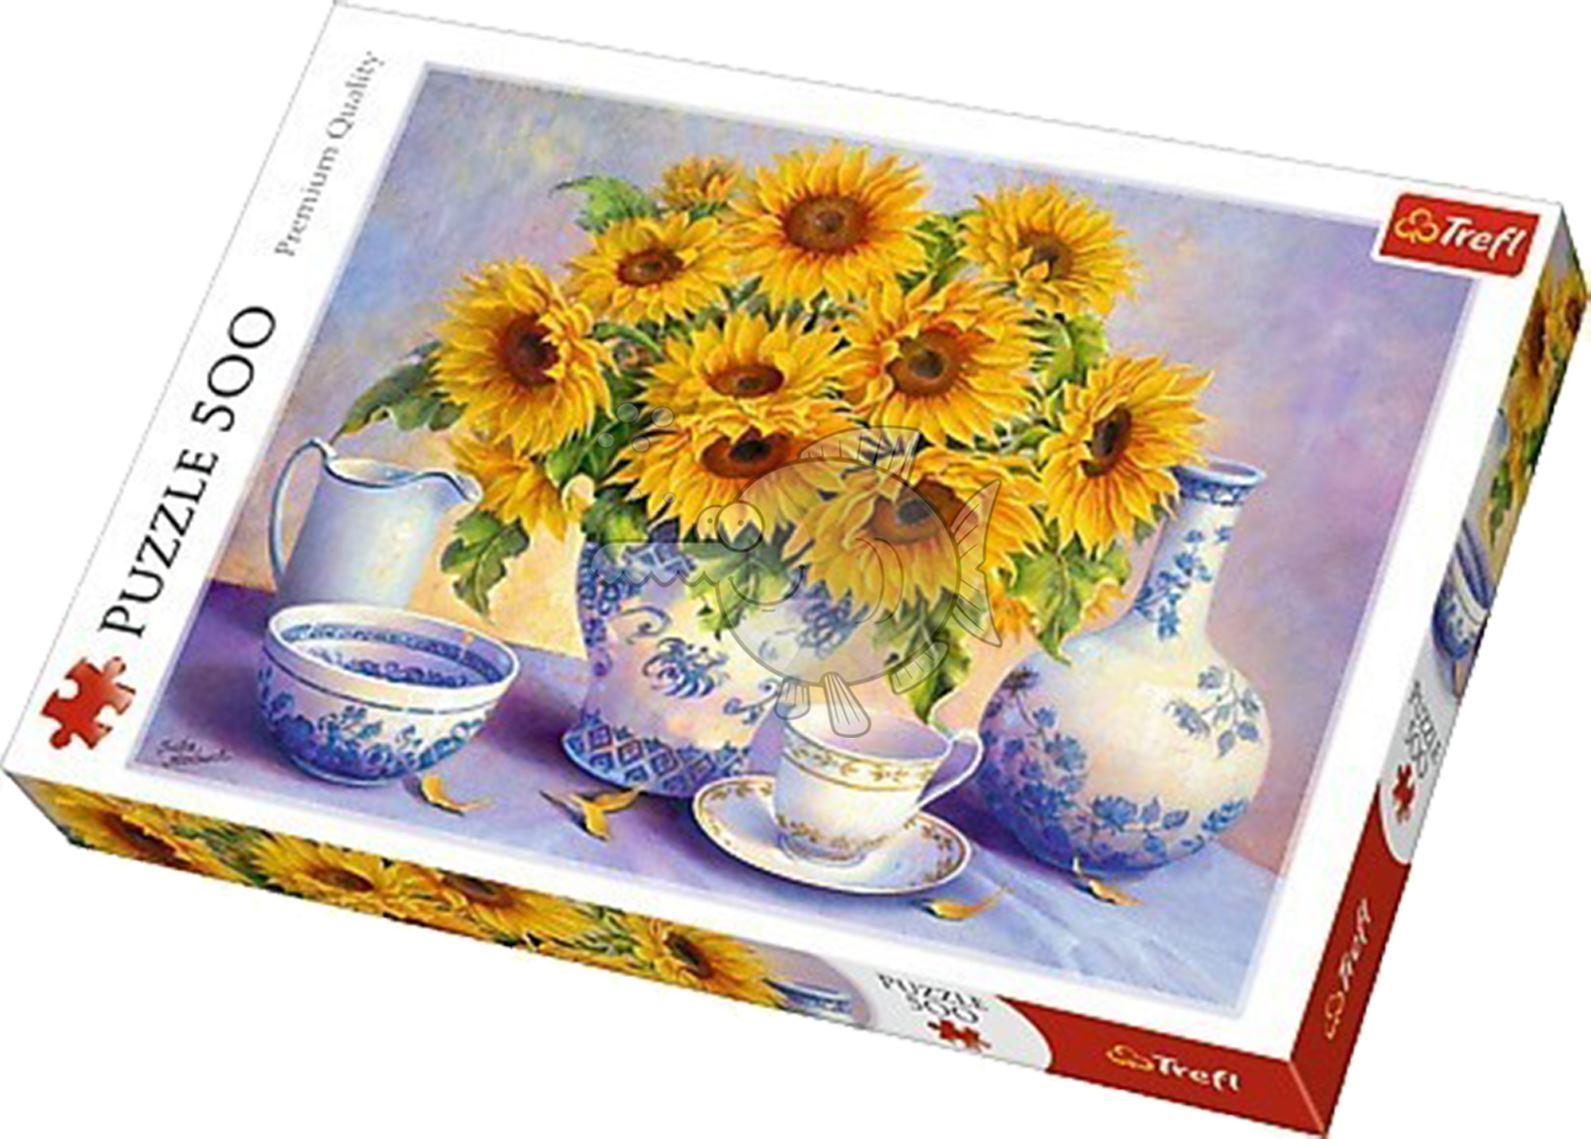 Trefl-300-500-1000-1500-2000-3000-4000-6000-Piece-Jigsaw-Puzzle-Landscapes-City thumbnail 355